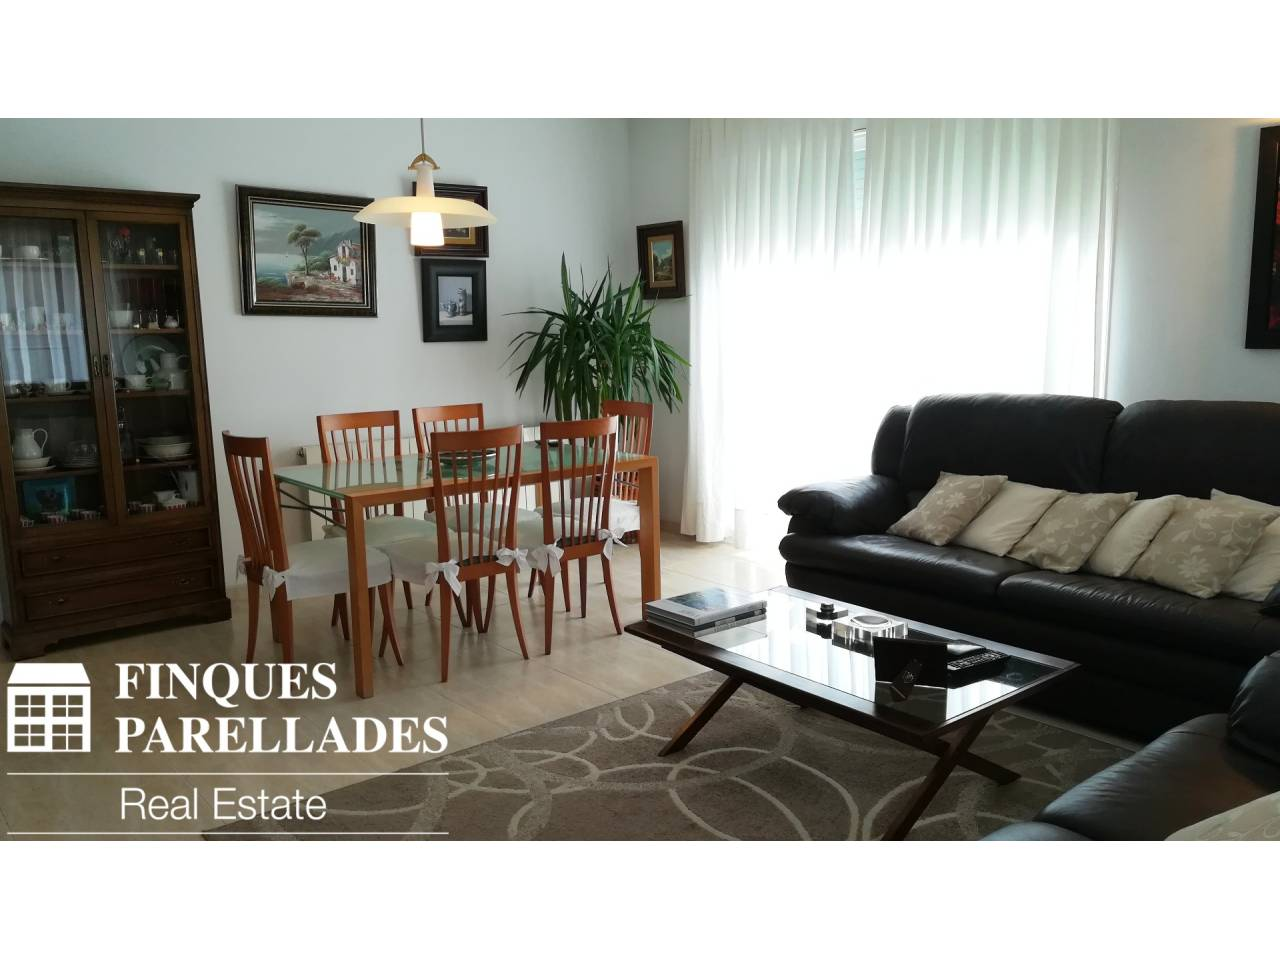 Flat for sale in Els Molins-Poble Sec-Pins Vens